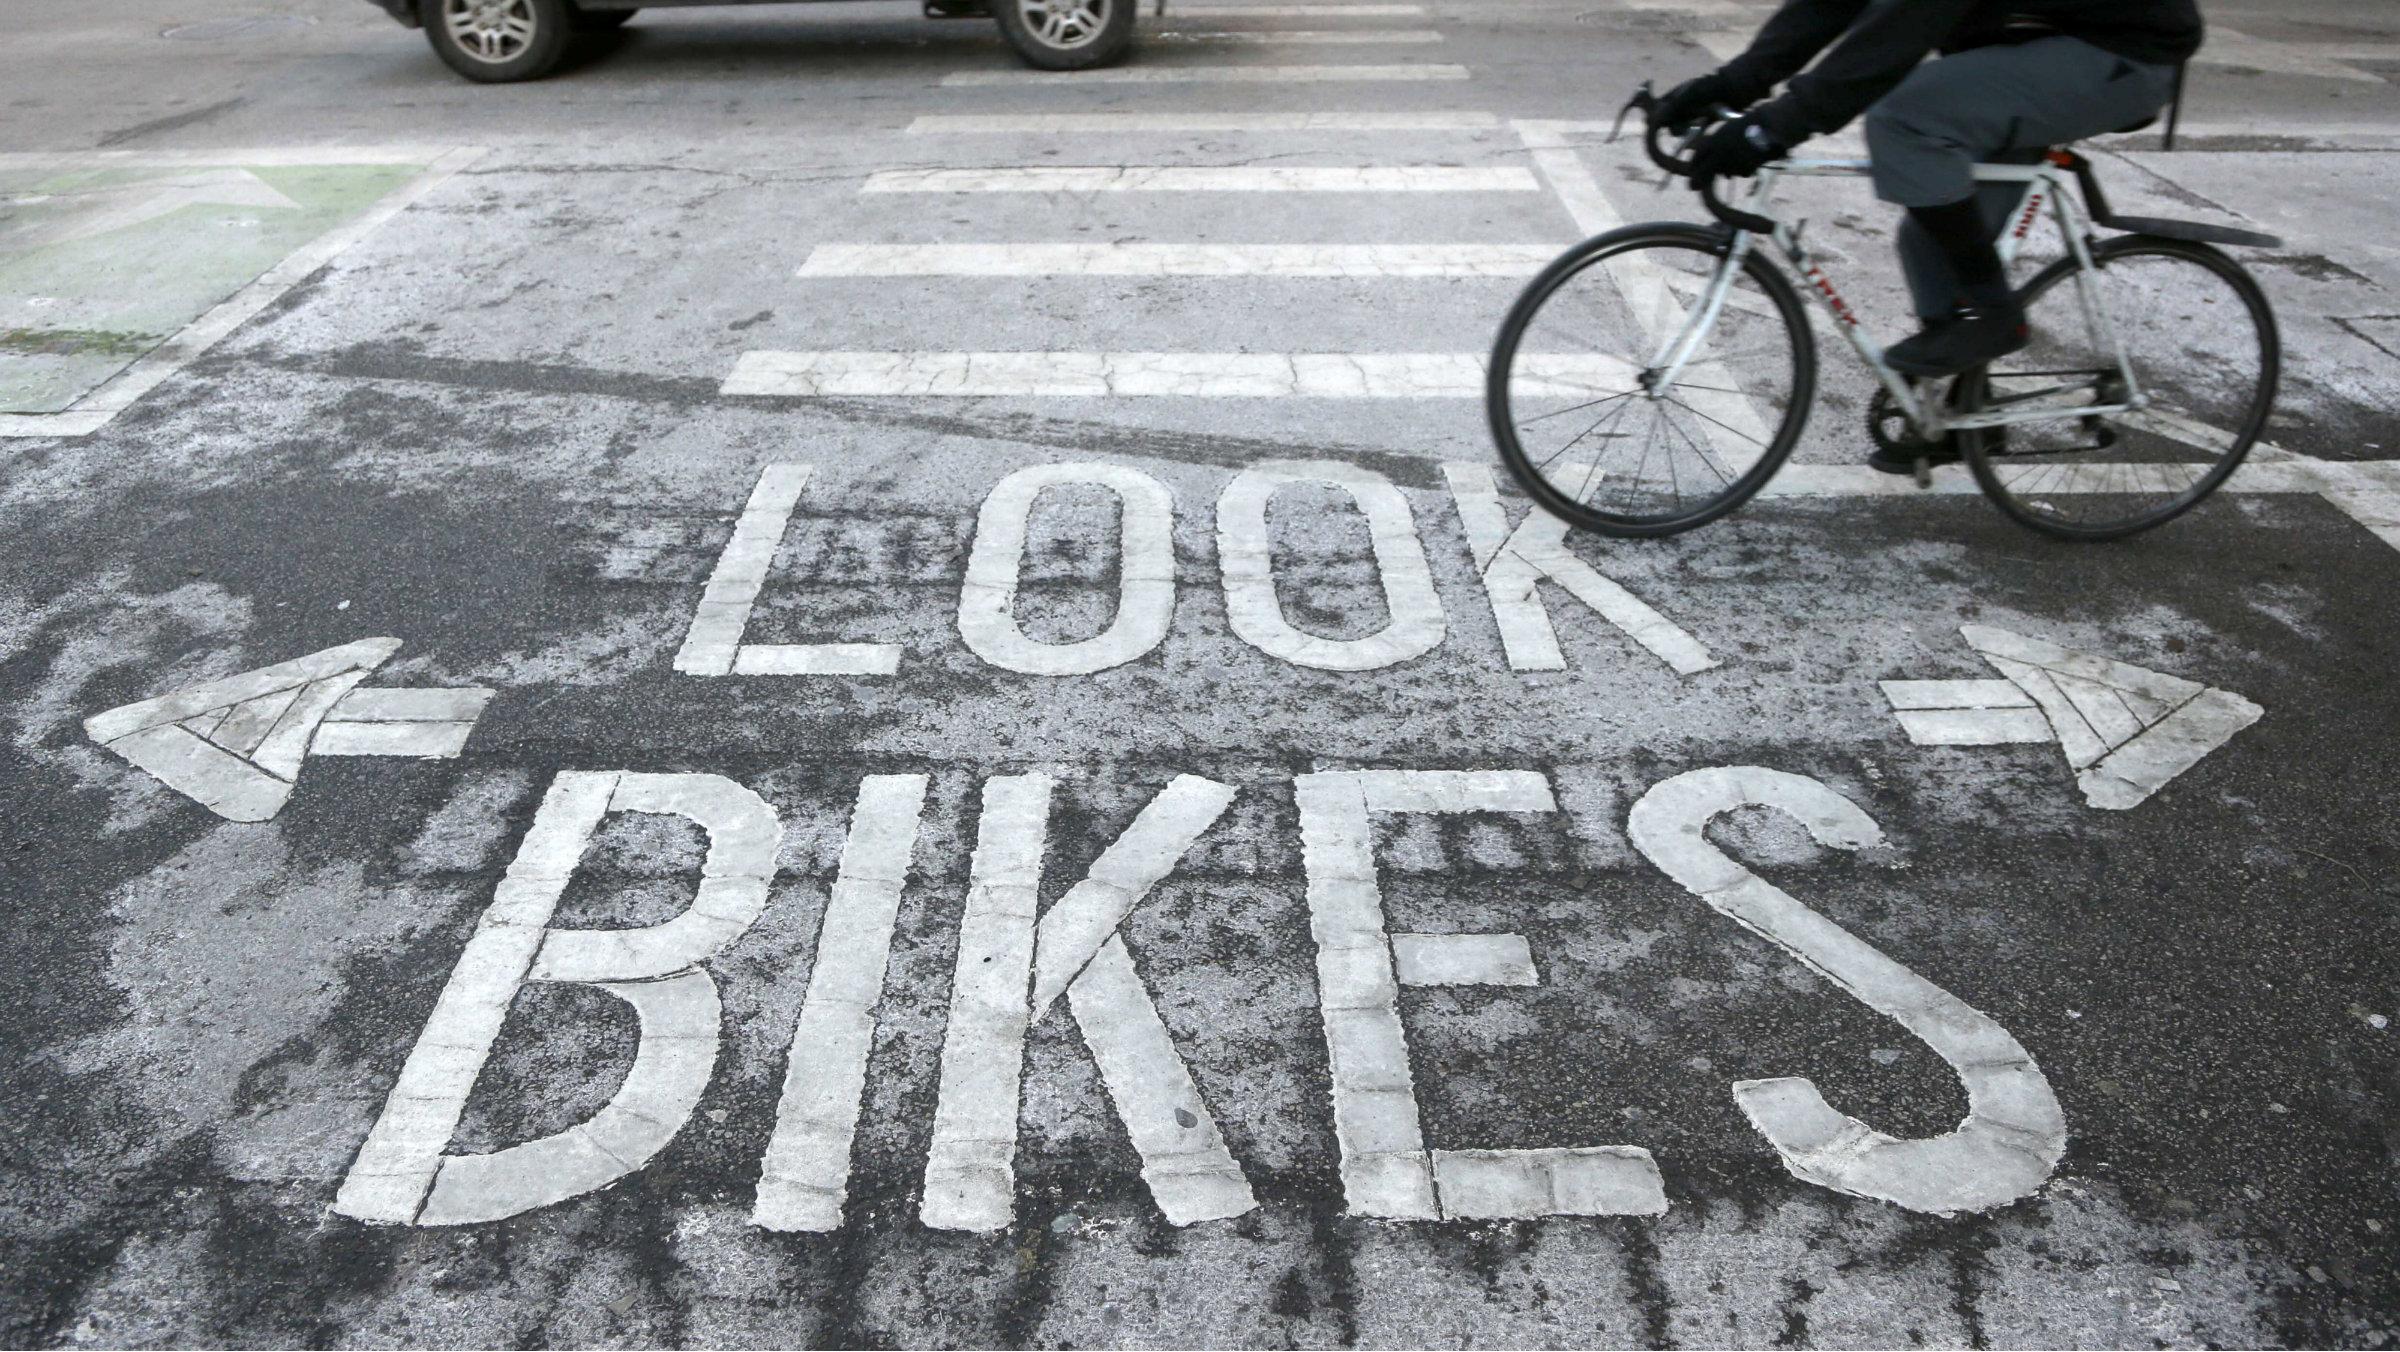 Bike path to innovation.